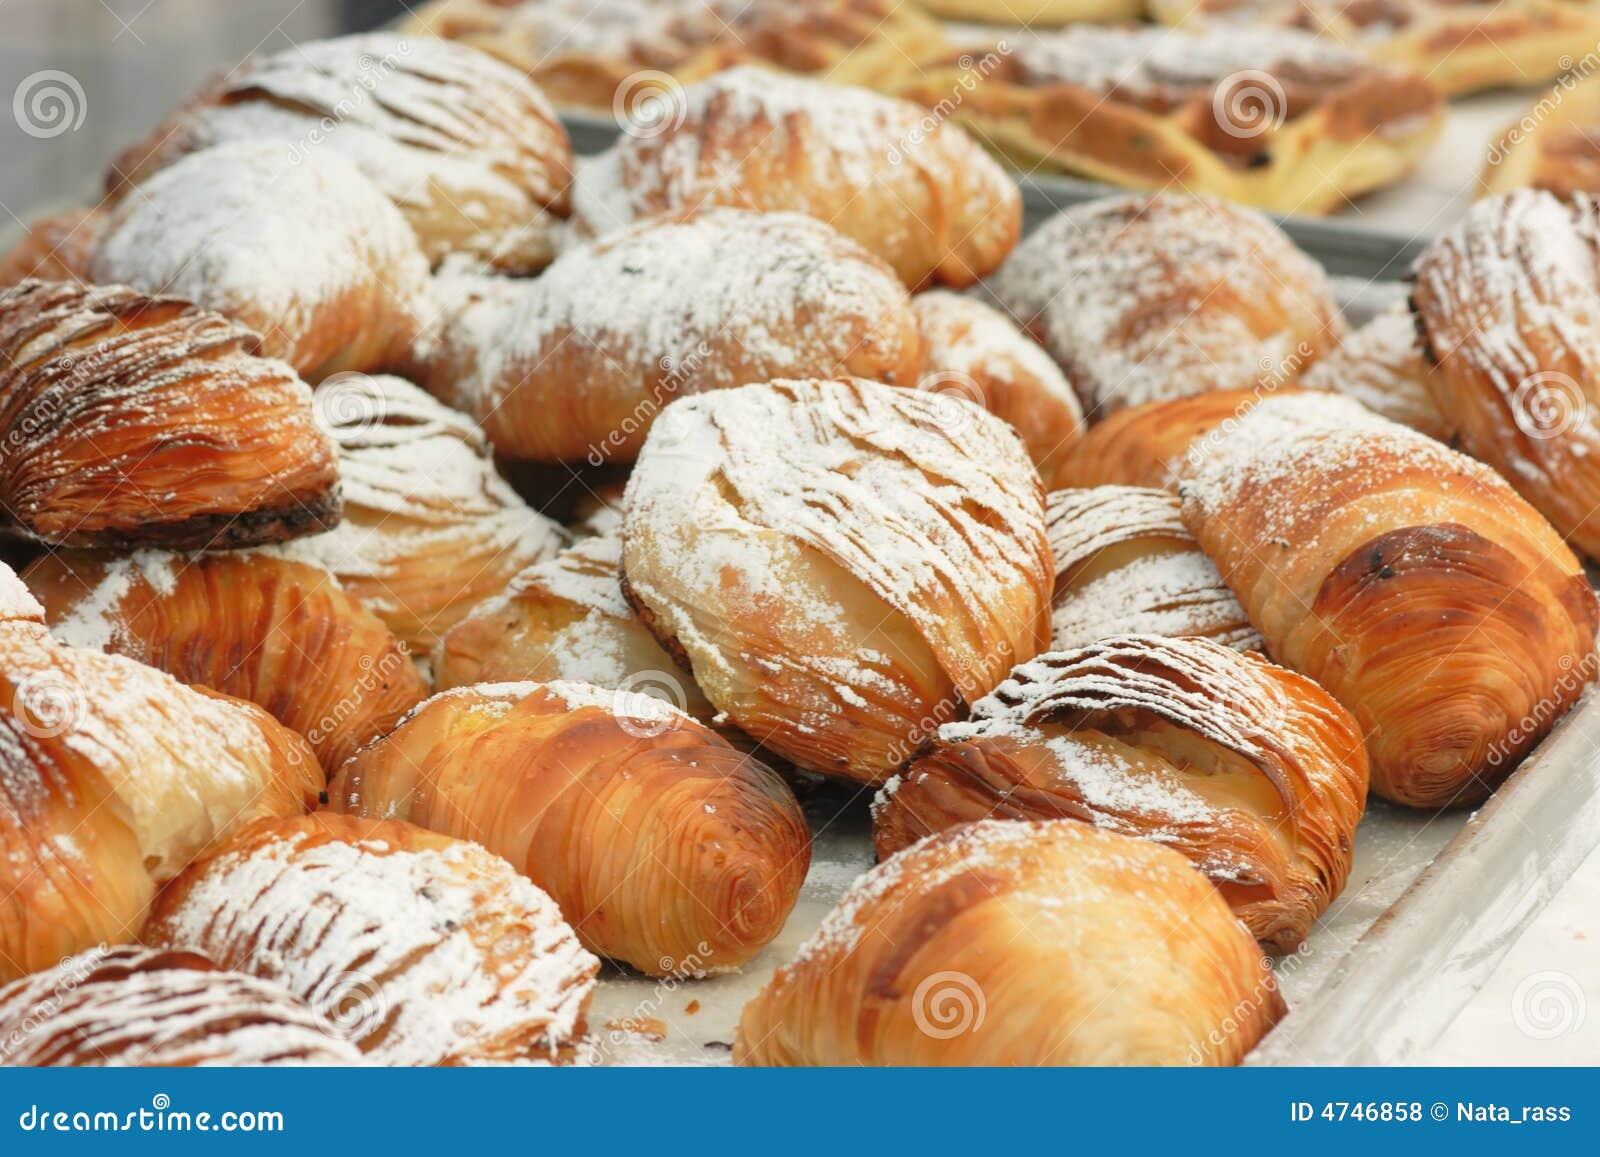 Italian Sfogliatelle Pastry Royalty Free Stock Photos - Image: 4746858